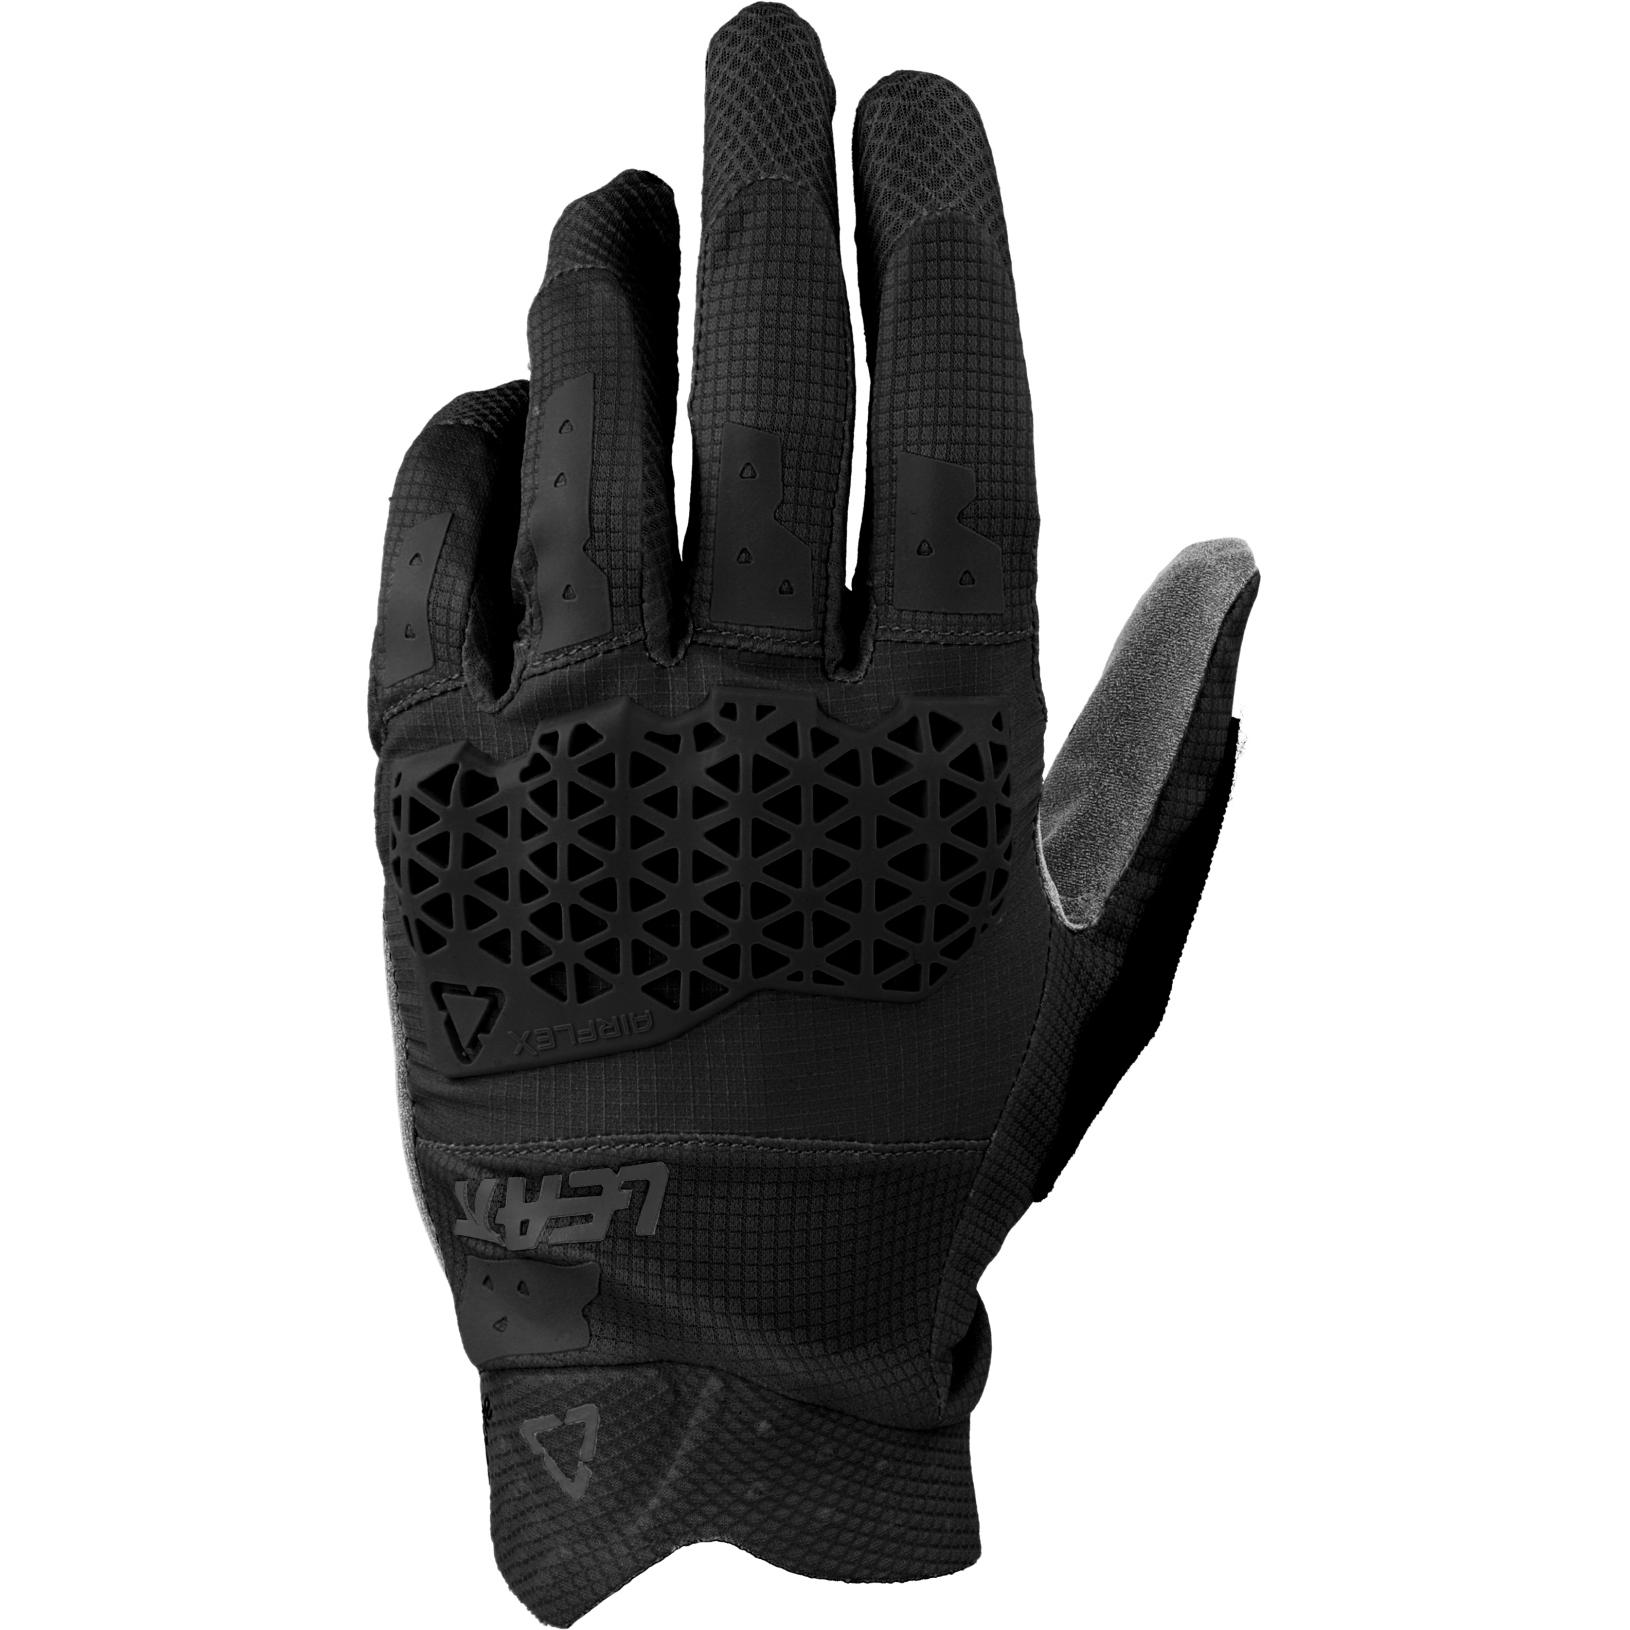 Leatt Glove DBX 3.0 Lite Handschuh - black